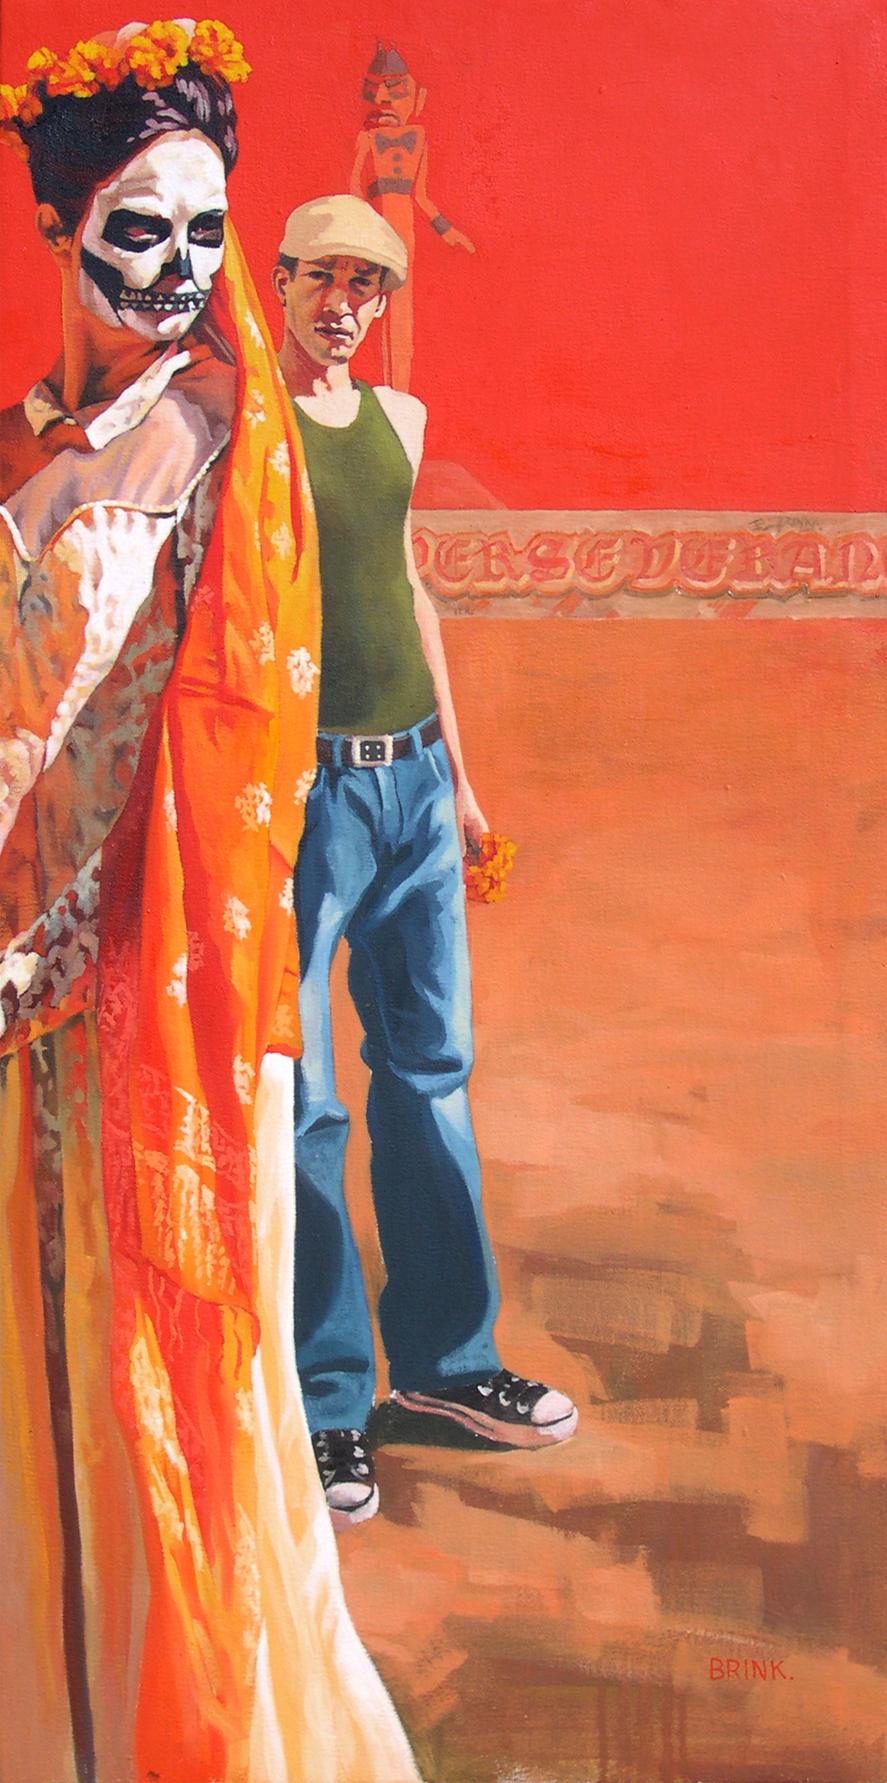 Battlefield, 40 x 20 in, oil on canvas, 2003